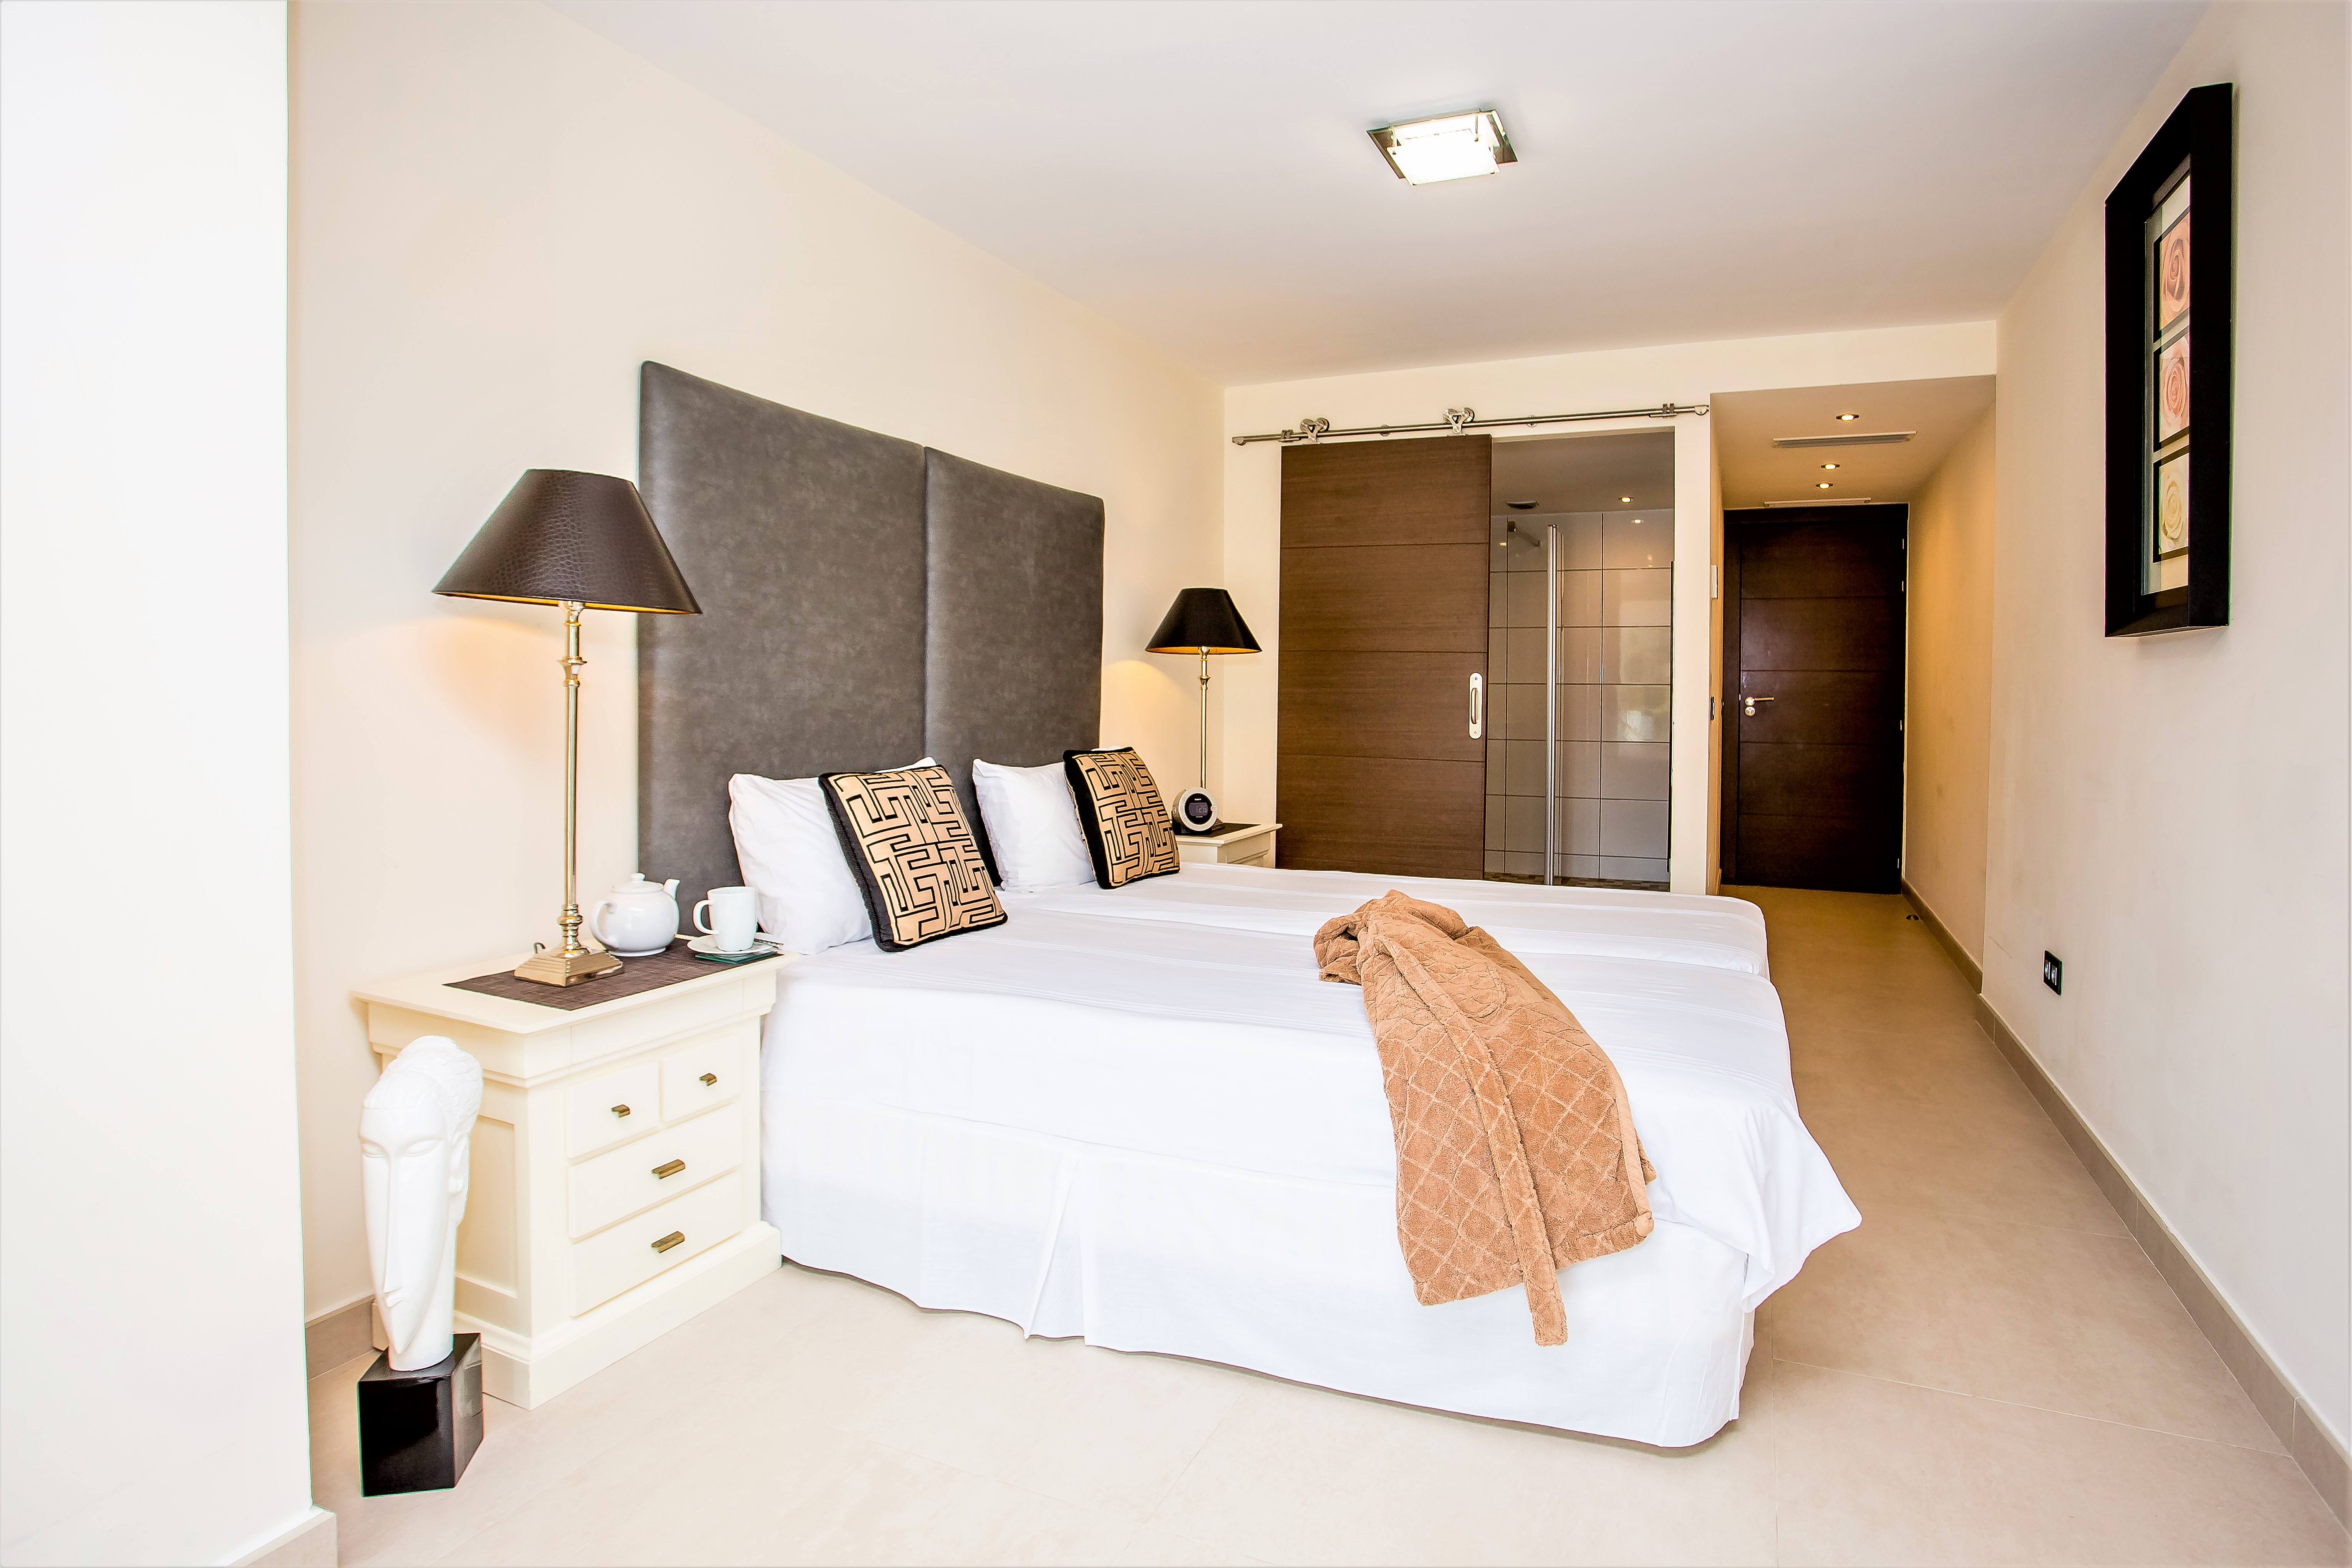 Apartment 5 B R VILLA BY PUERTO BANUS   SEA 5min                                photo 16876583